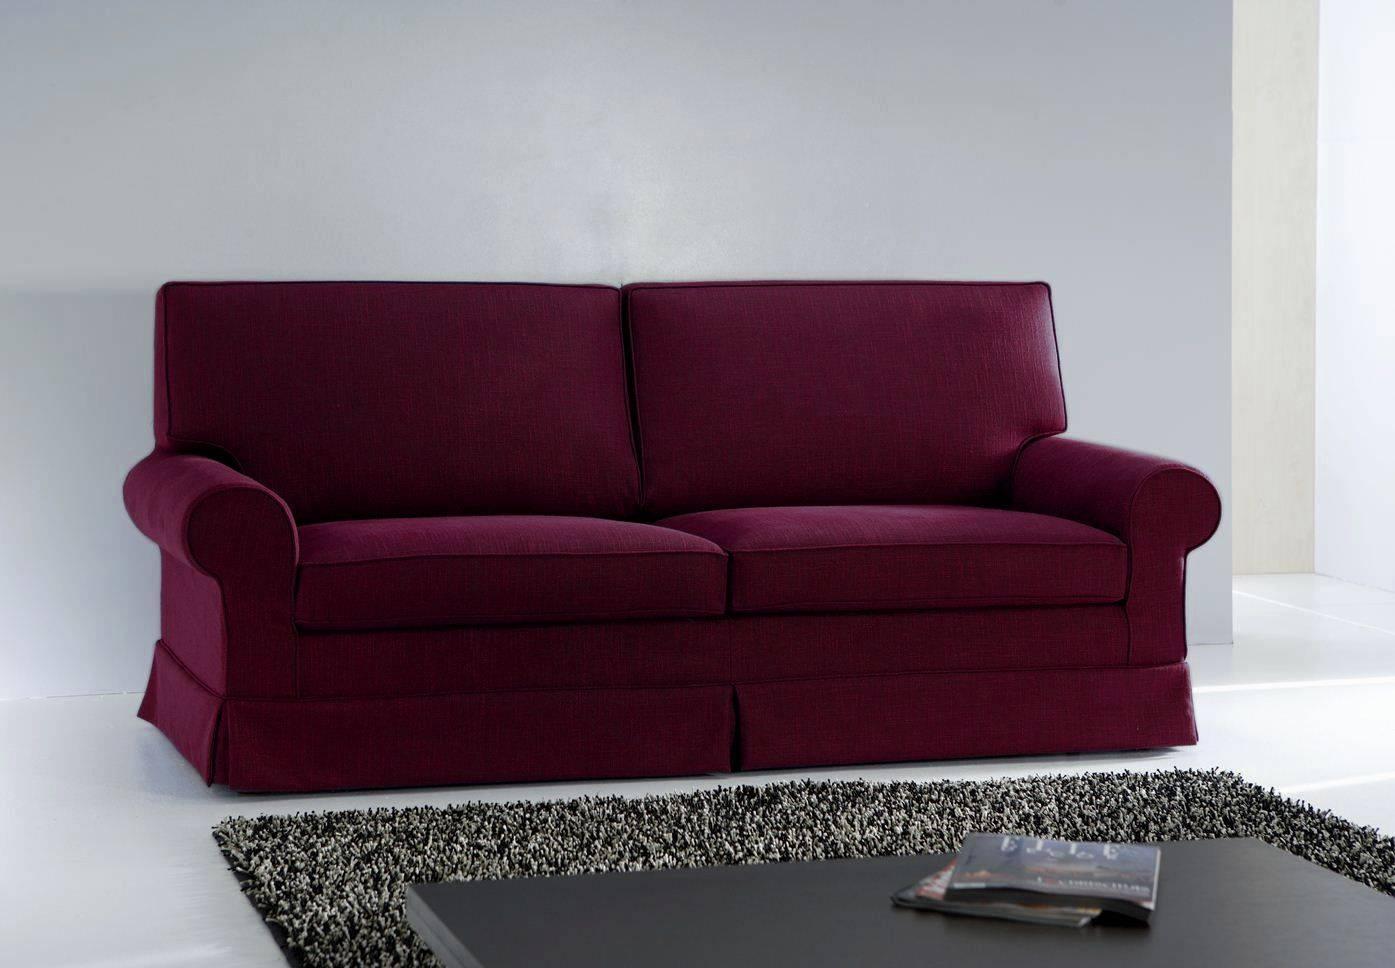 Fantastic Big Lots Sofa Sleeper Online | Gallery Image And Wallpaper in Big Lots Sofa Sleeper (Image 7 of 30)